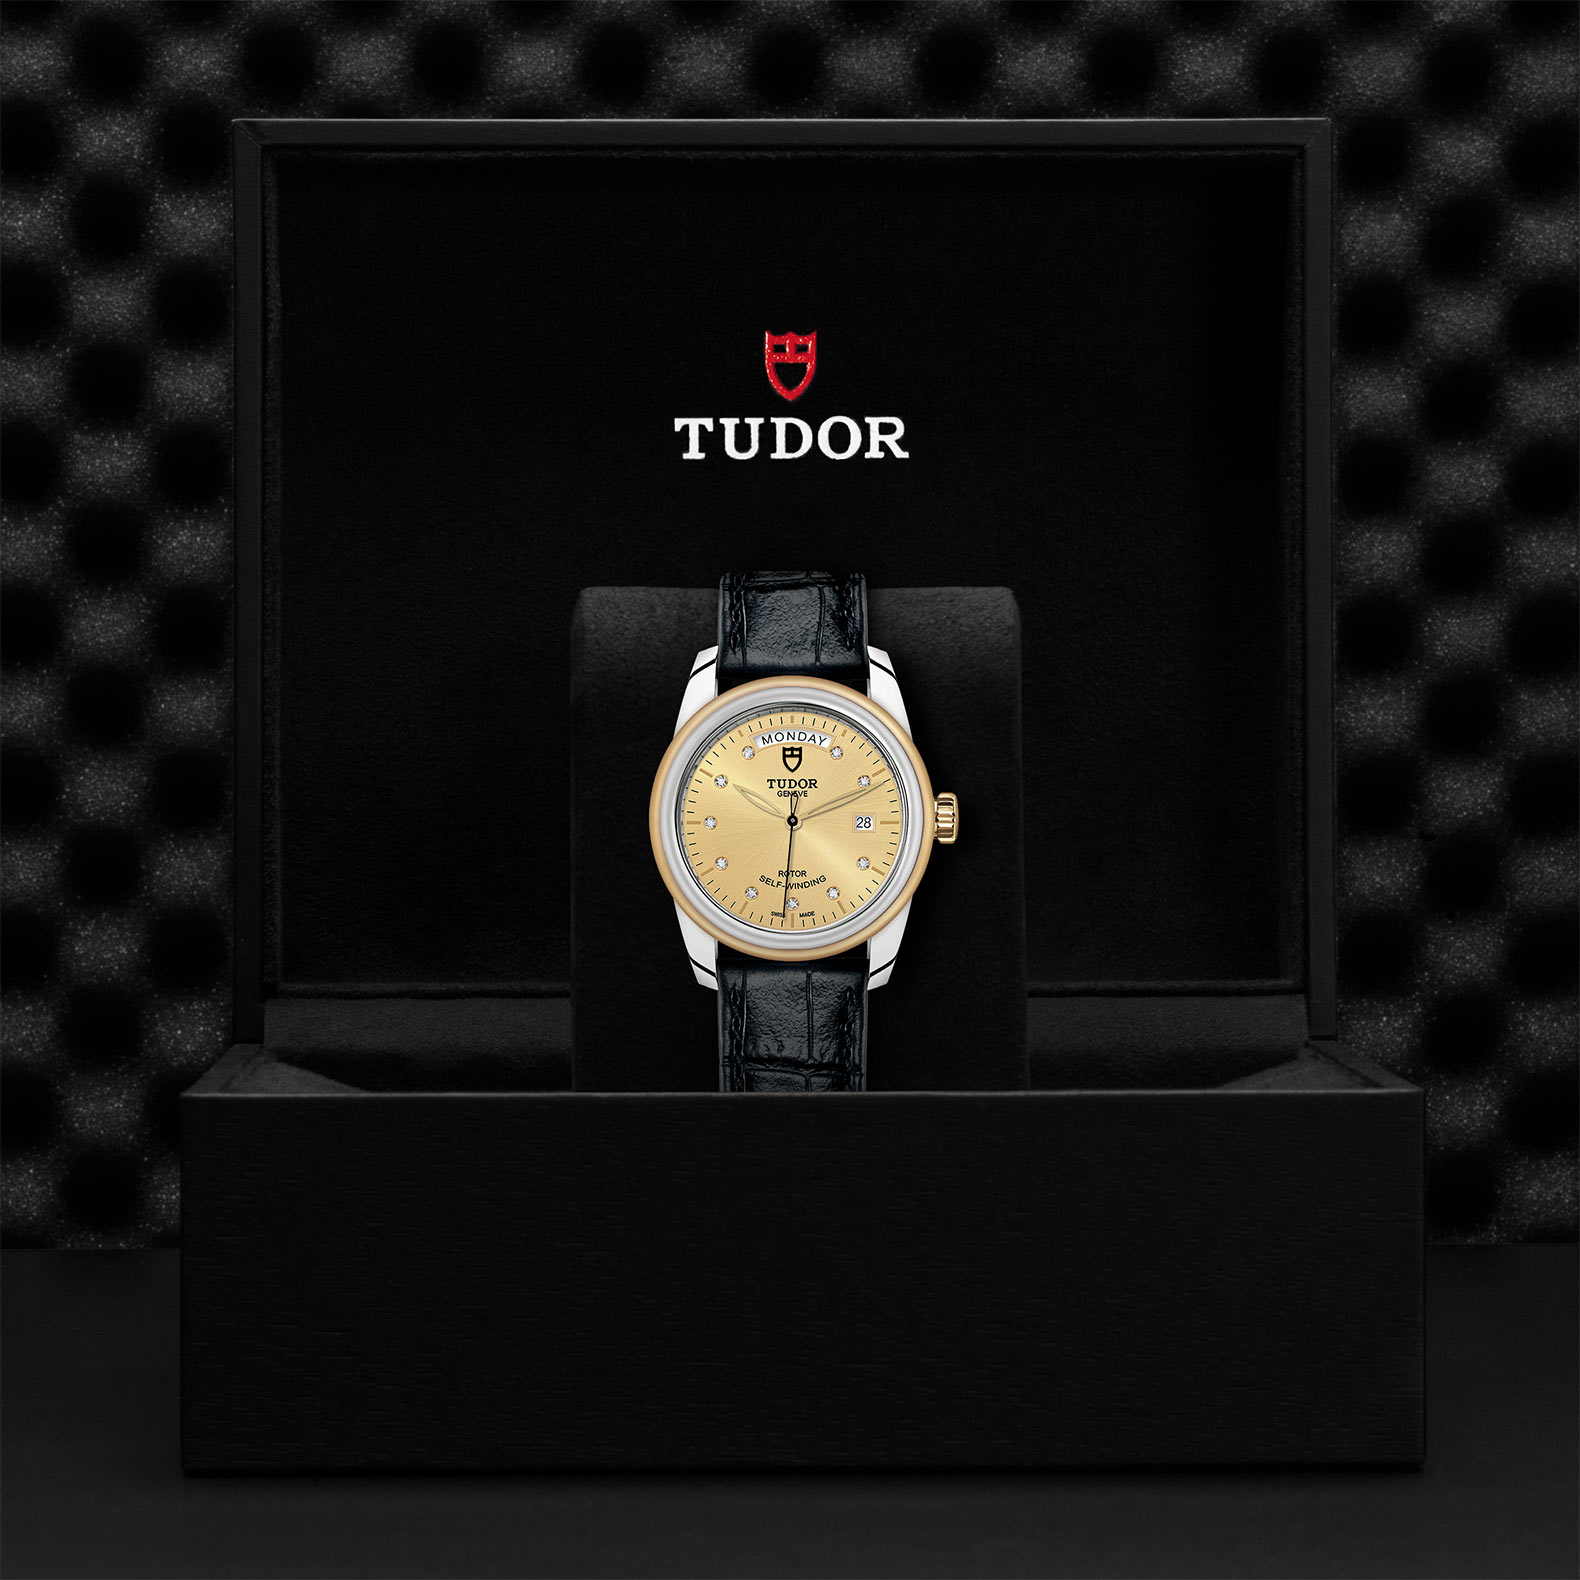 TUDOR Glamour Date Day M56003 0035 Presentationbox